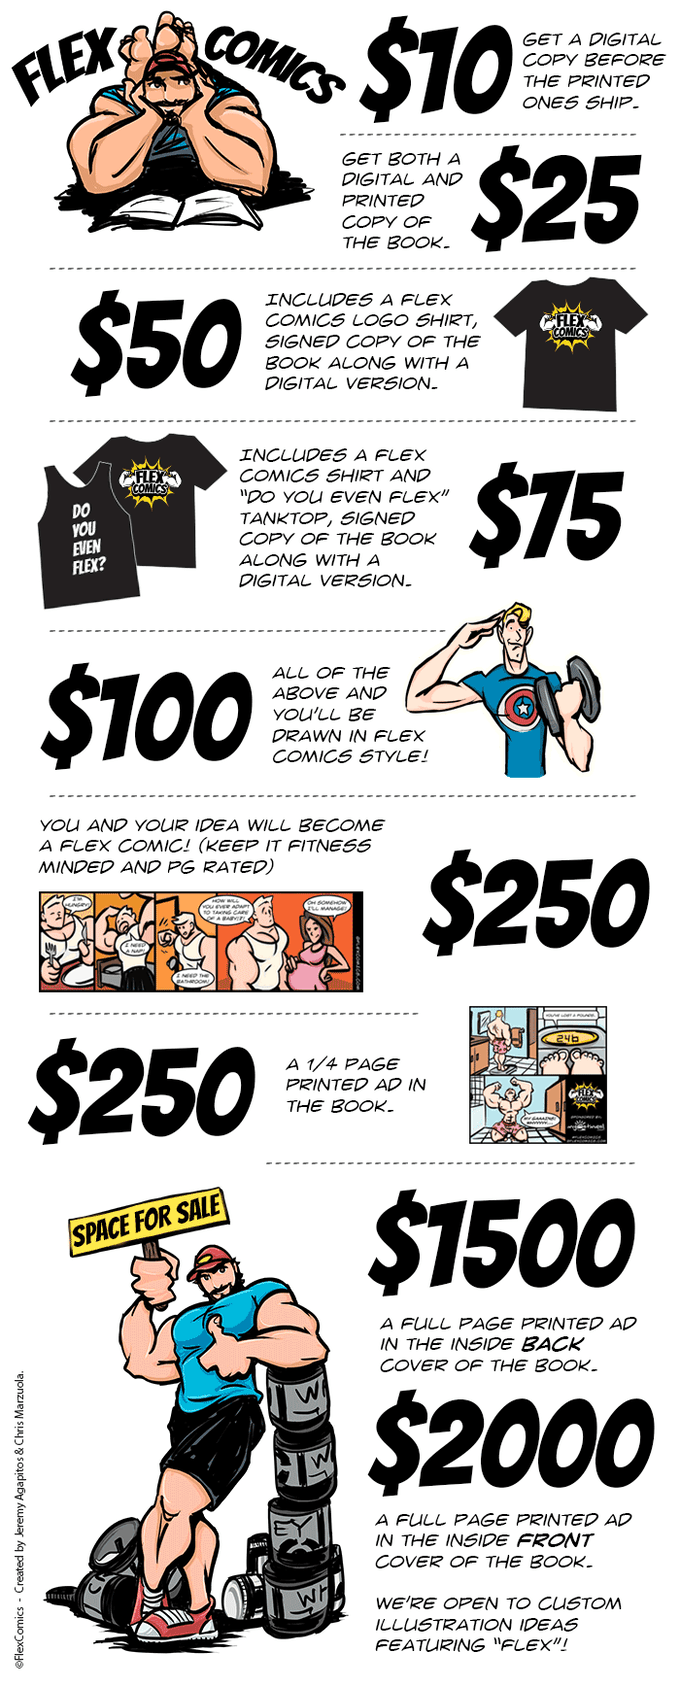 Flex Comics: Do You Even Flex? Kickstarter Book